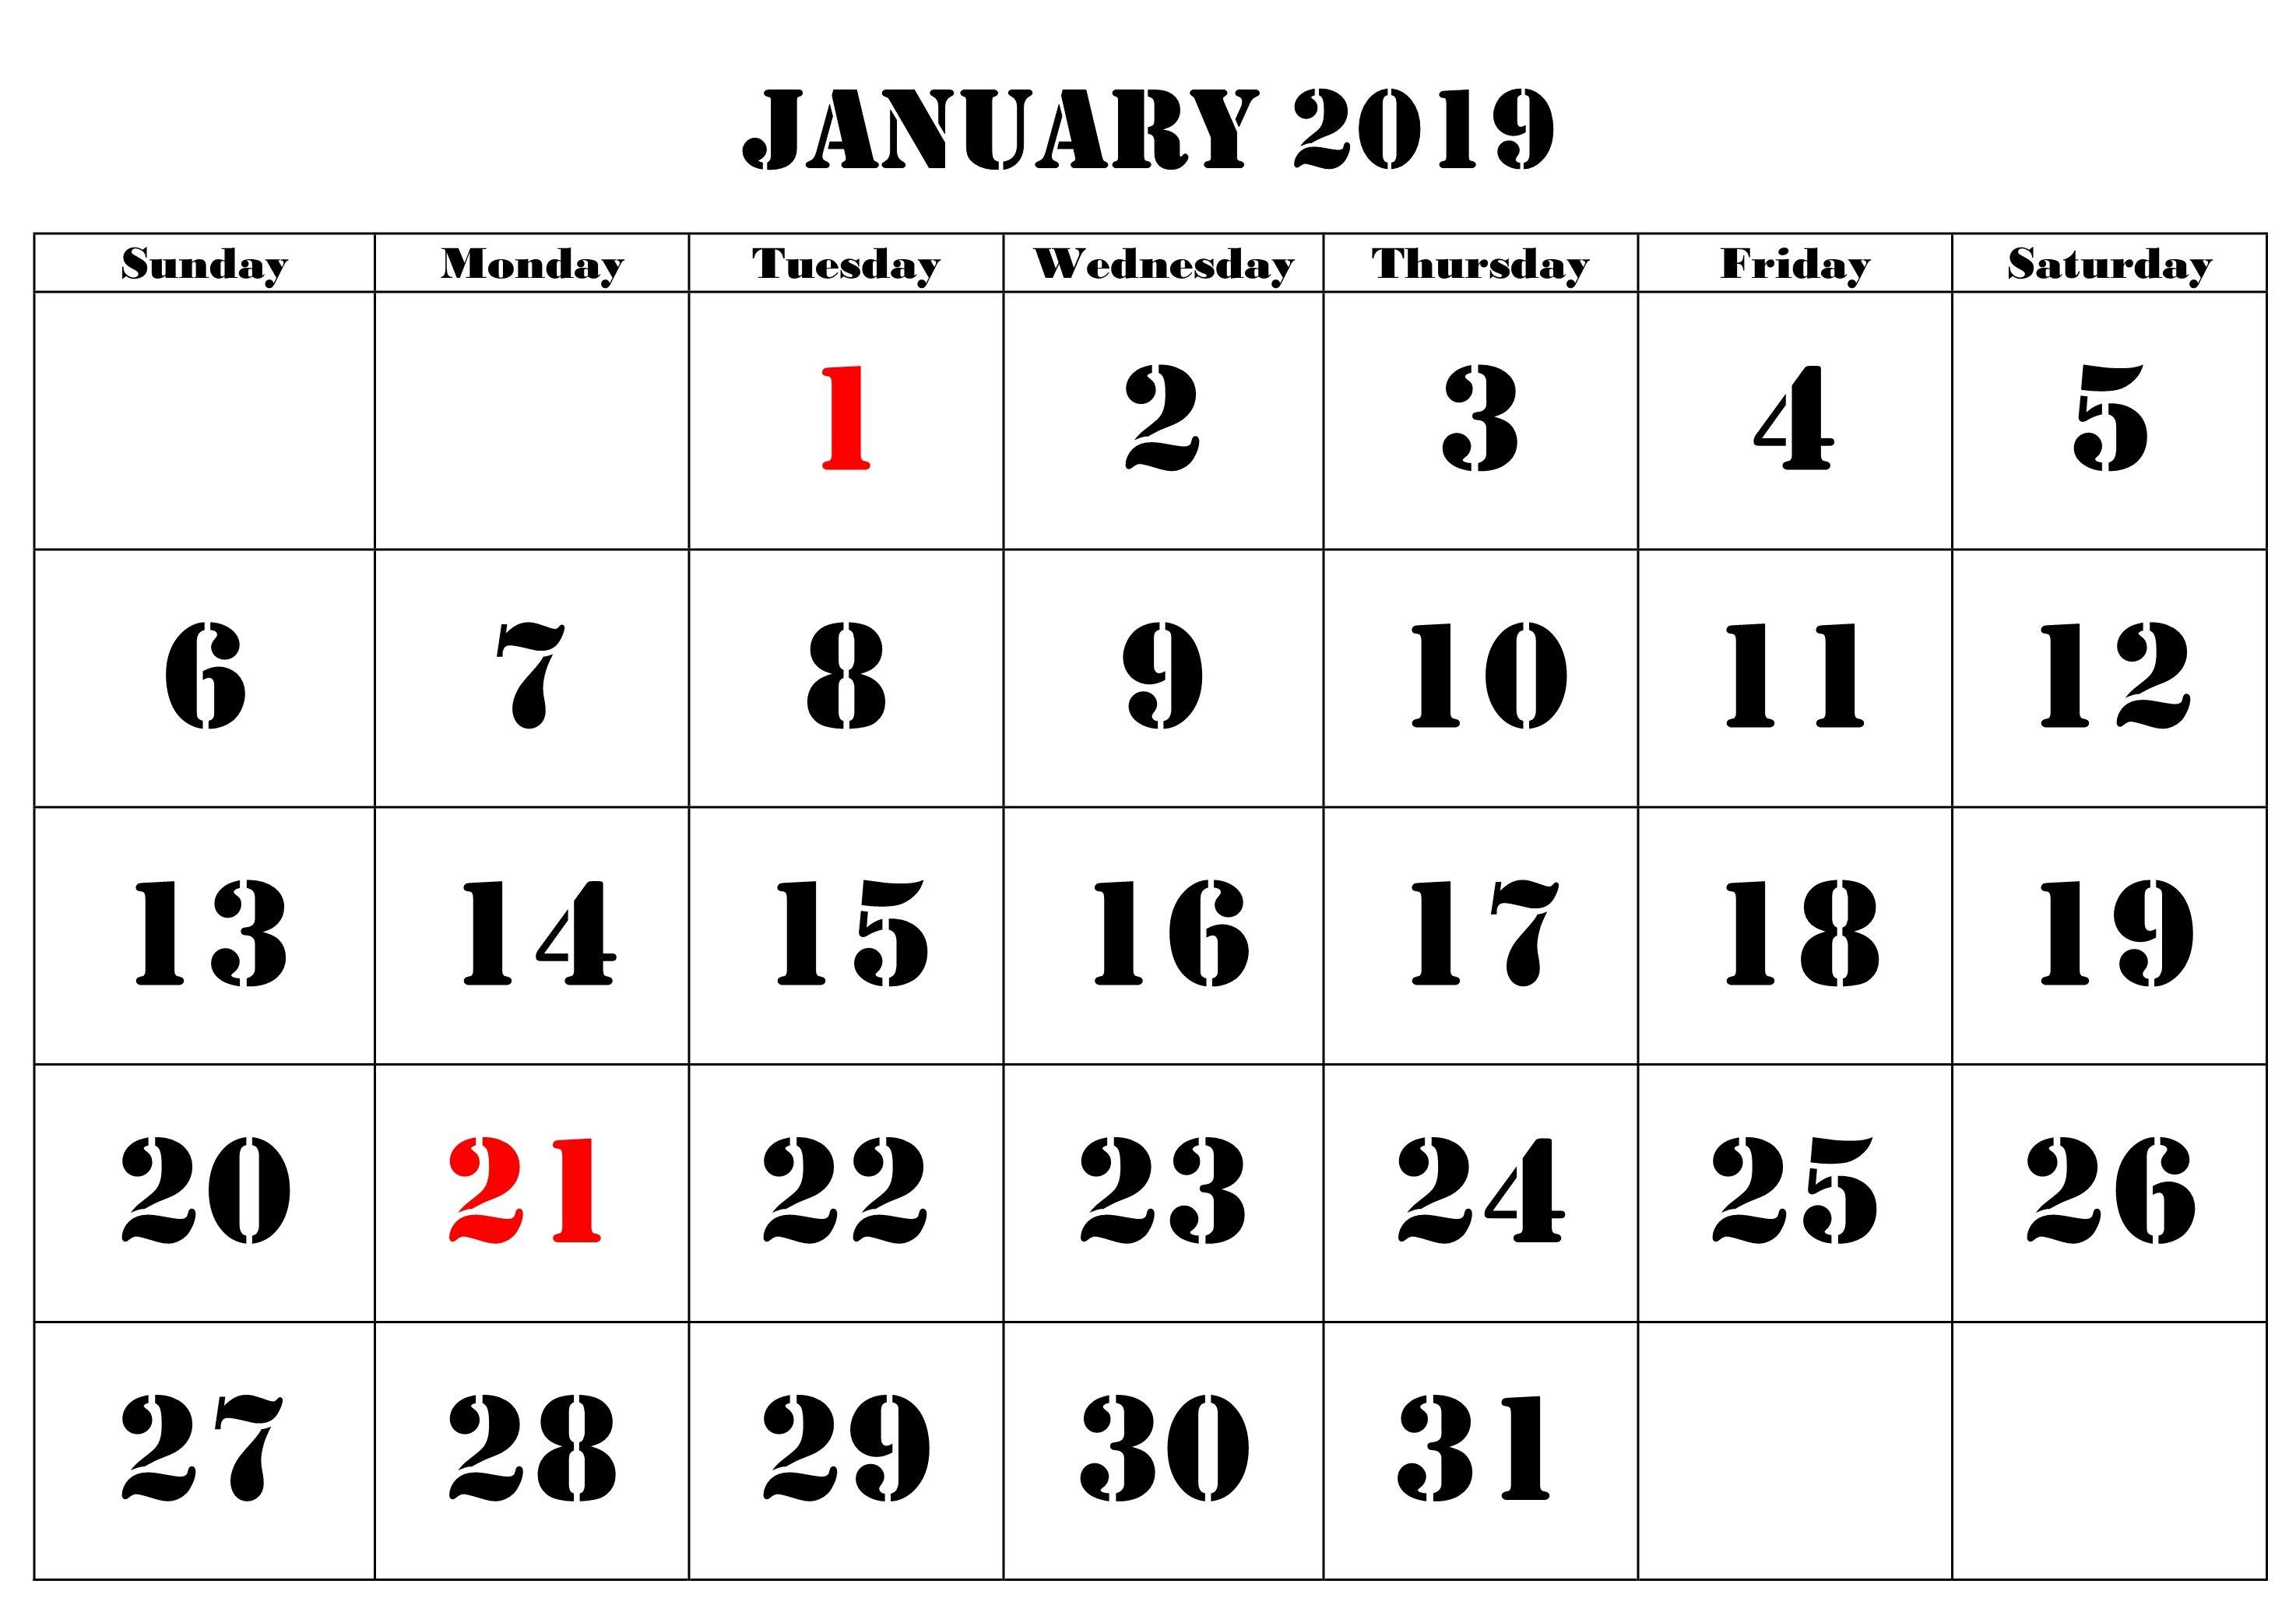 January Calendar 2019 Page